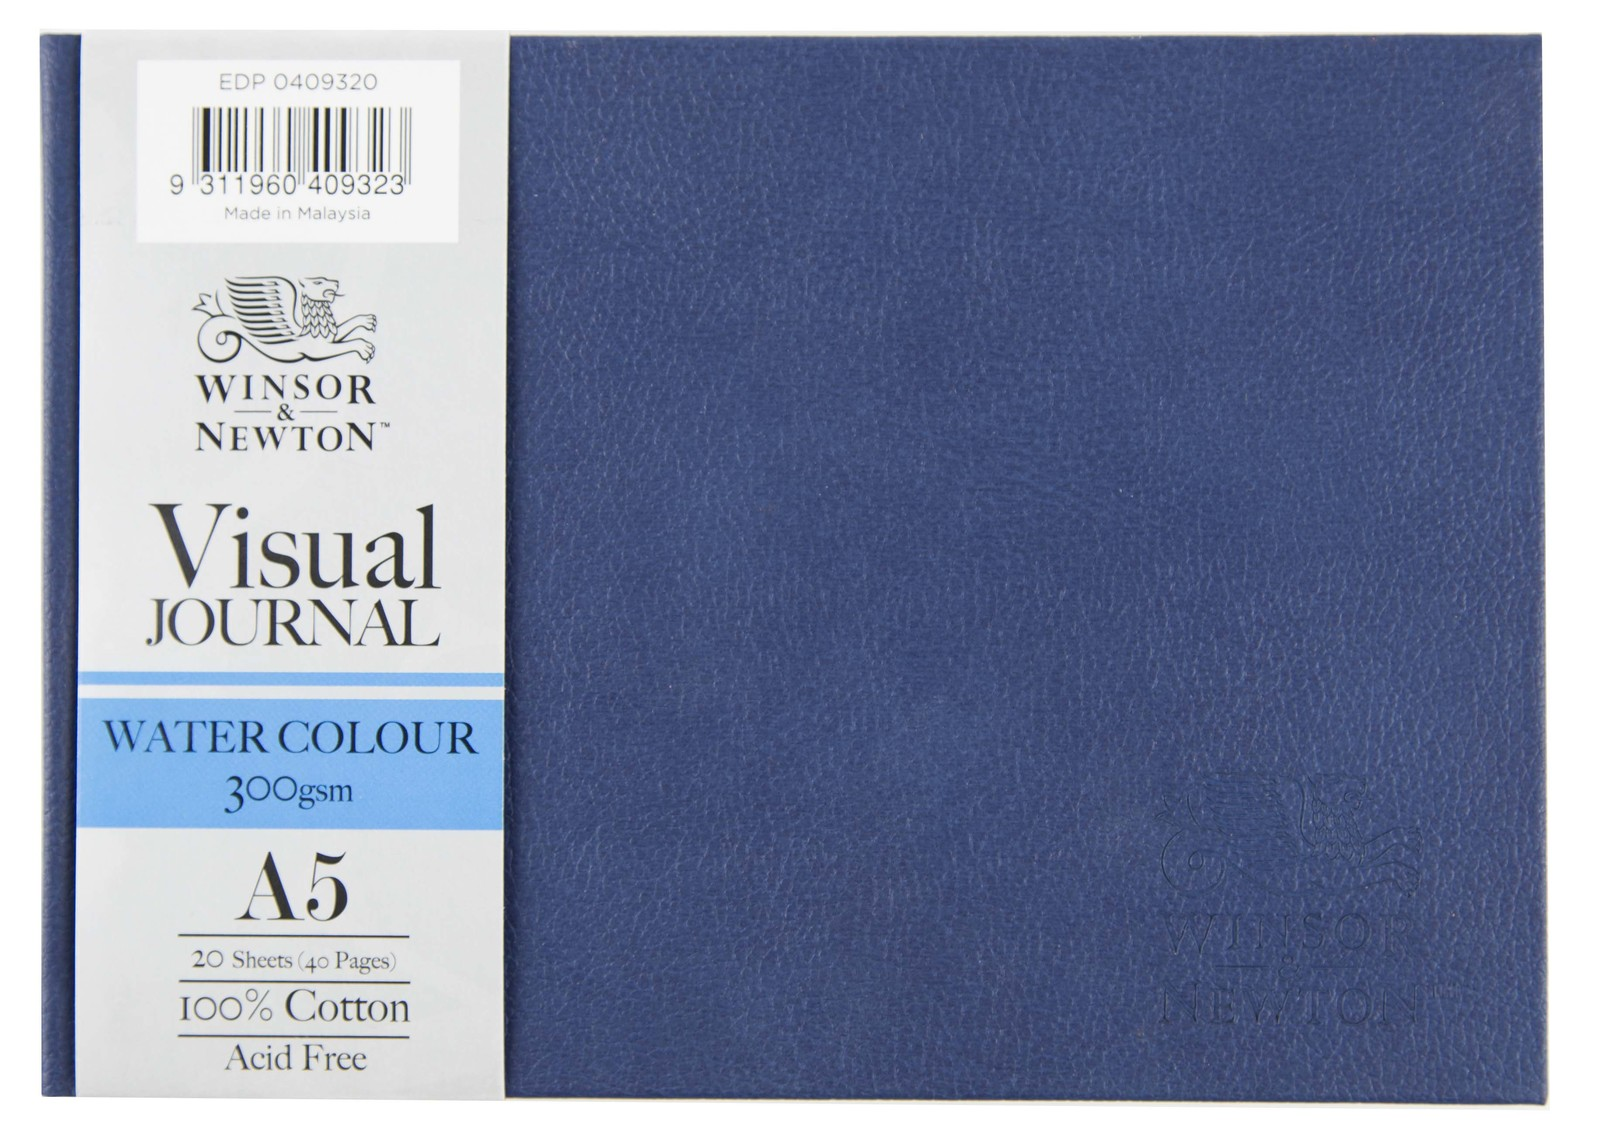 Winsor & Newton: Hardbound Watercolour Journal - A5 (300gsm) image